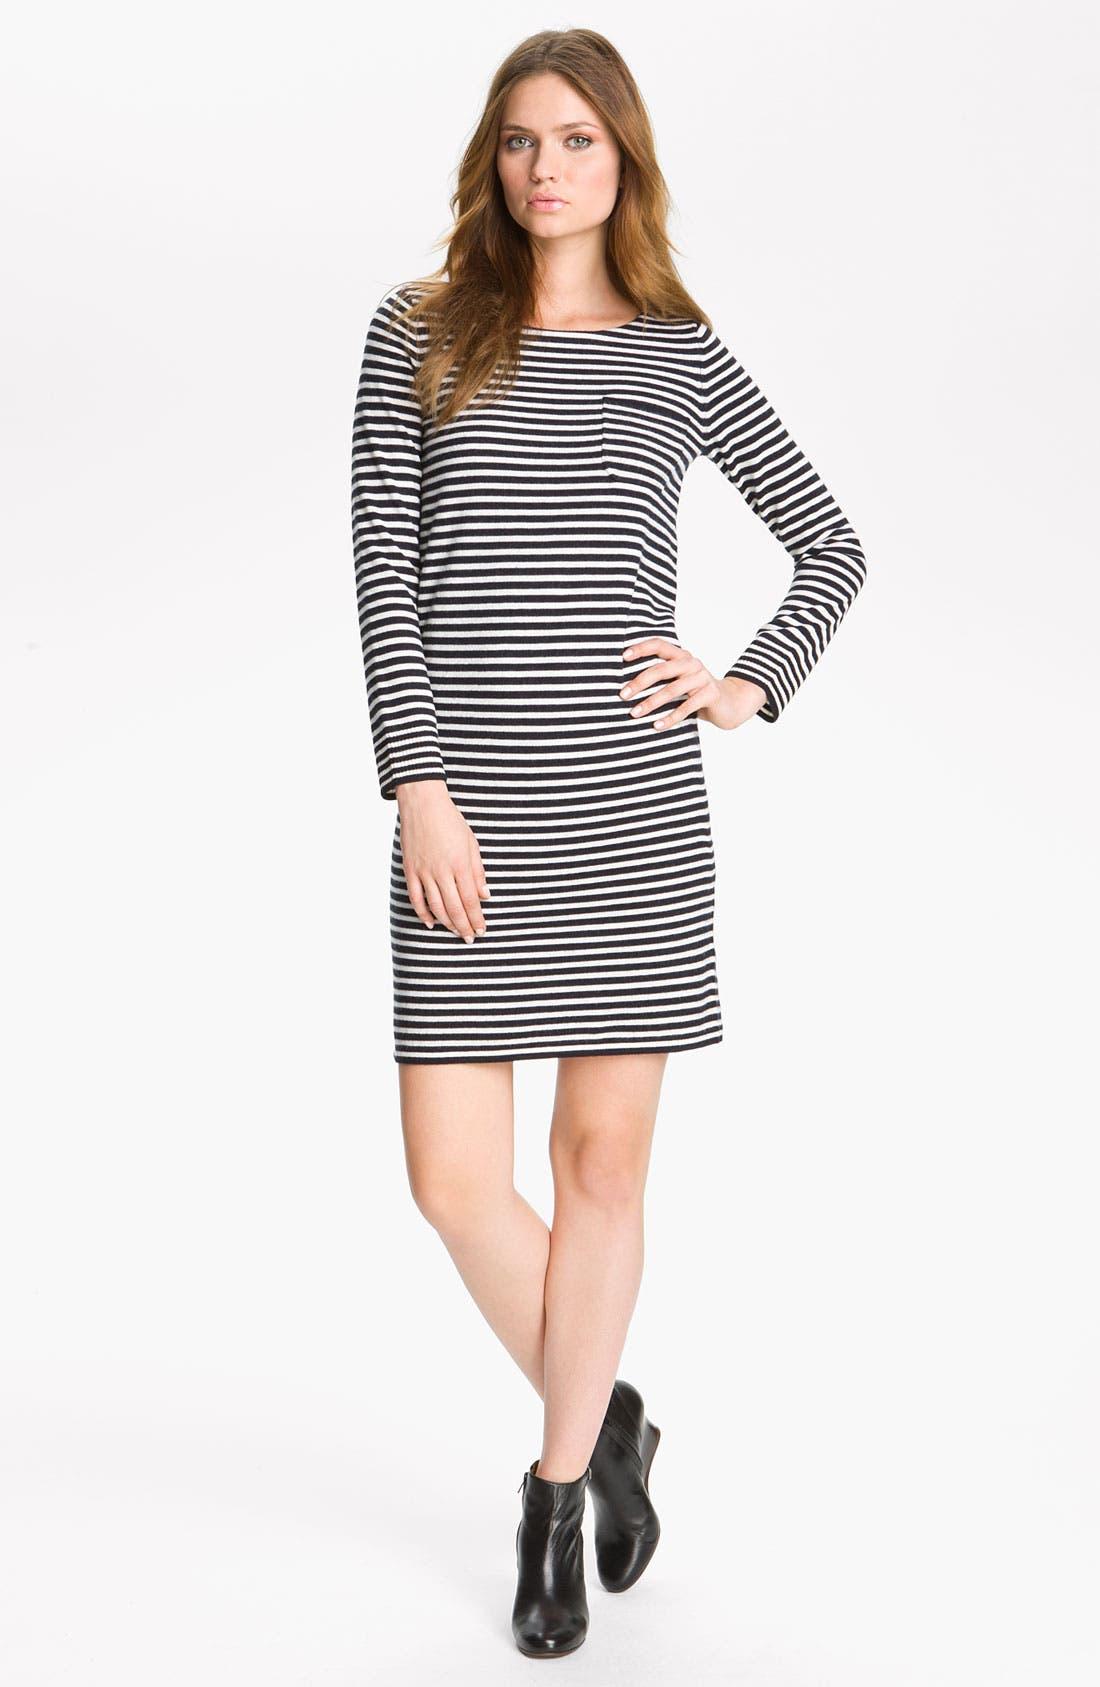 Main Image - A.P.C. Stripe Knit Dress